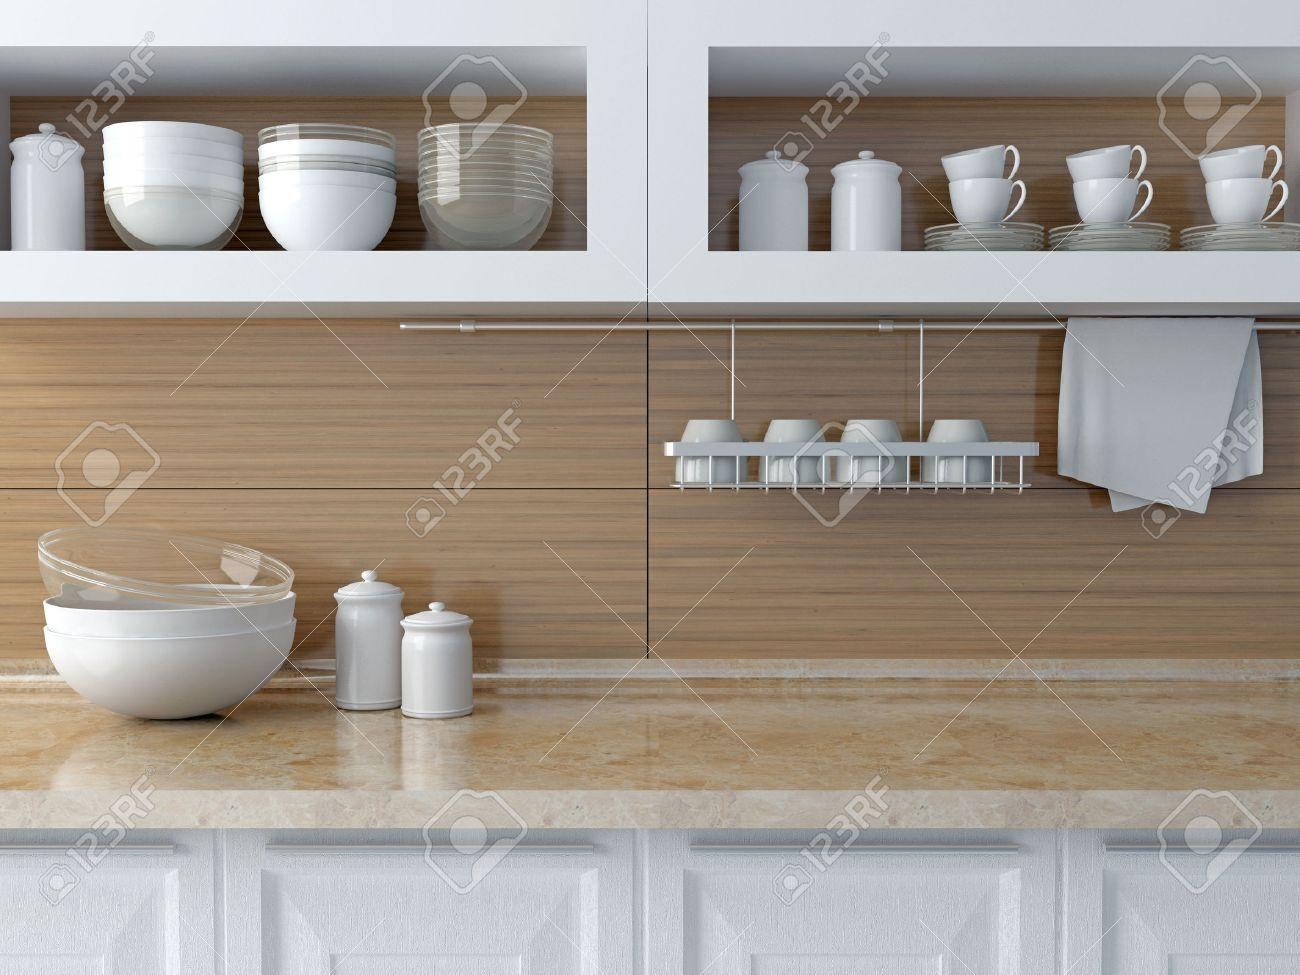 Modern Kitchen Design White Ceramic Kitchenware On The Marble